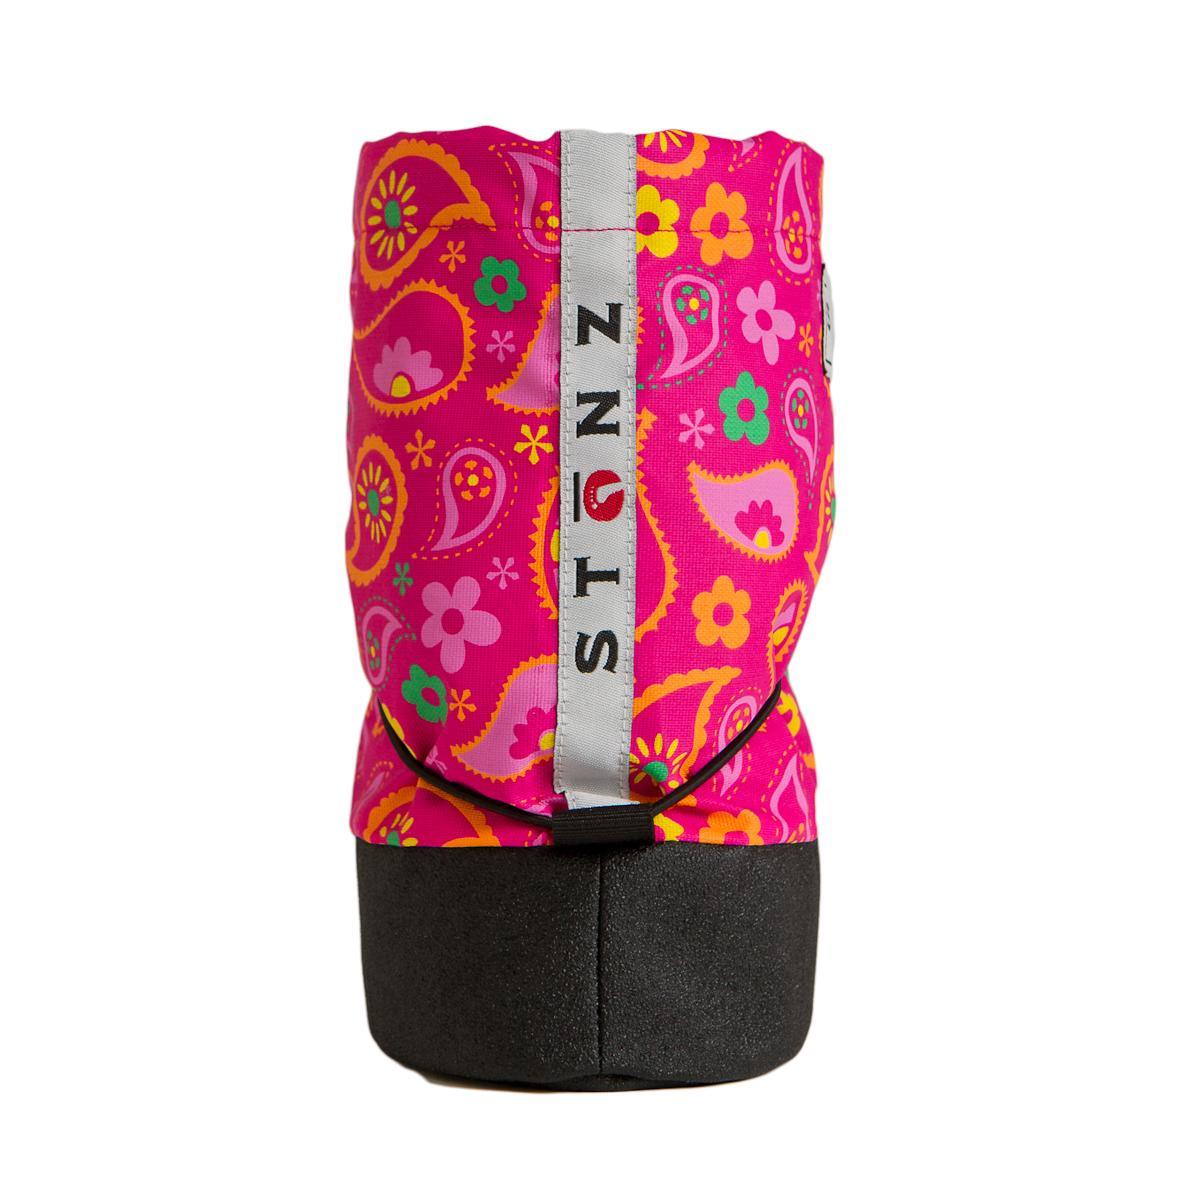 Stonz Booties - Paisley Pink - Fuchsia  - Stonz